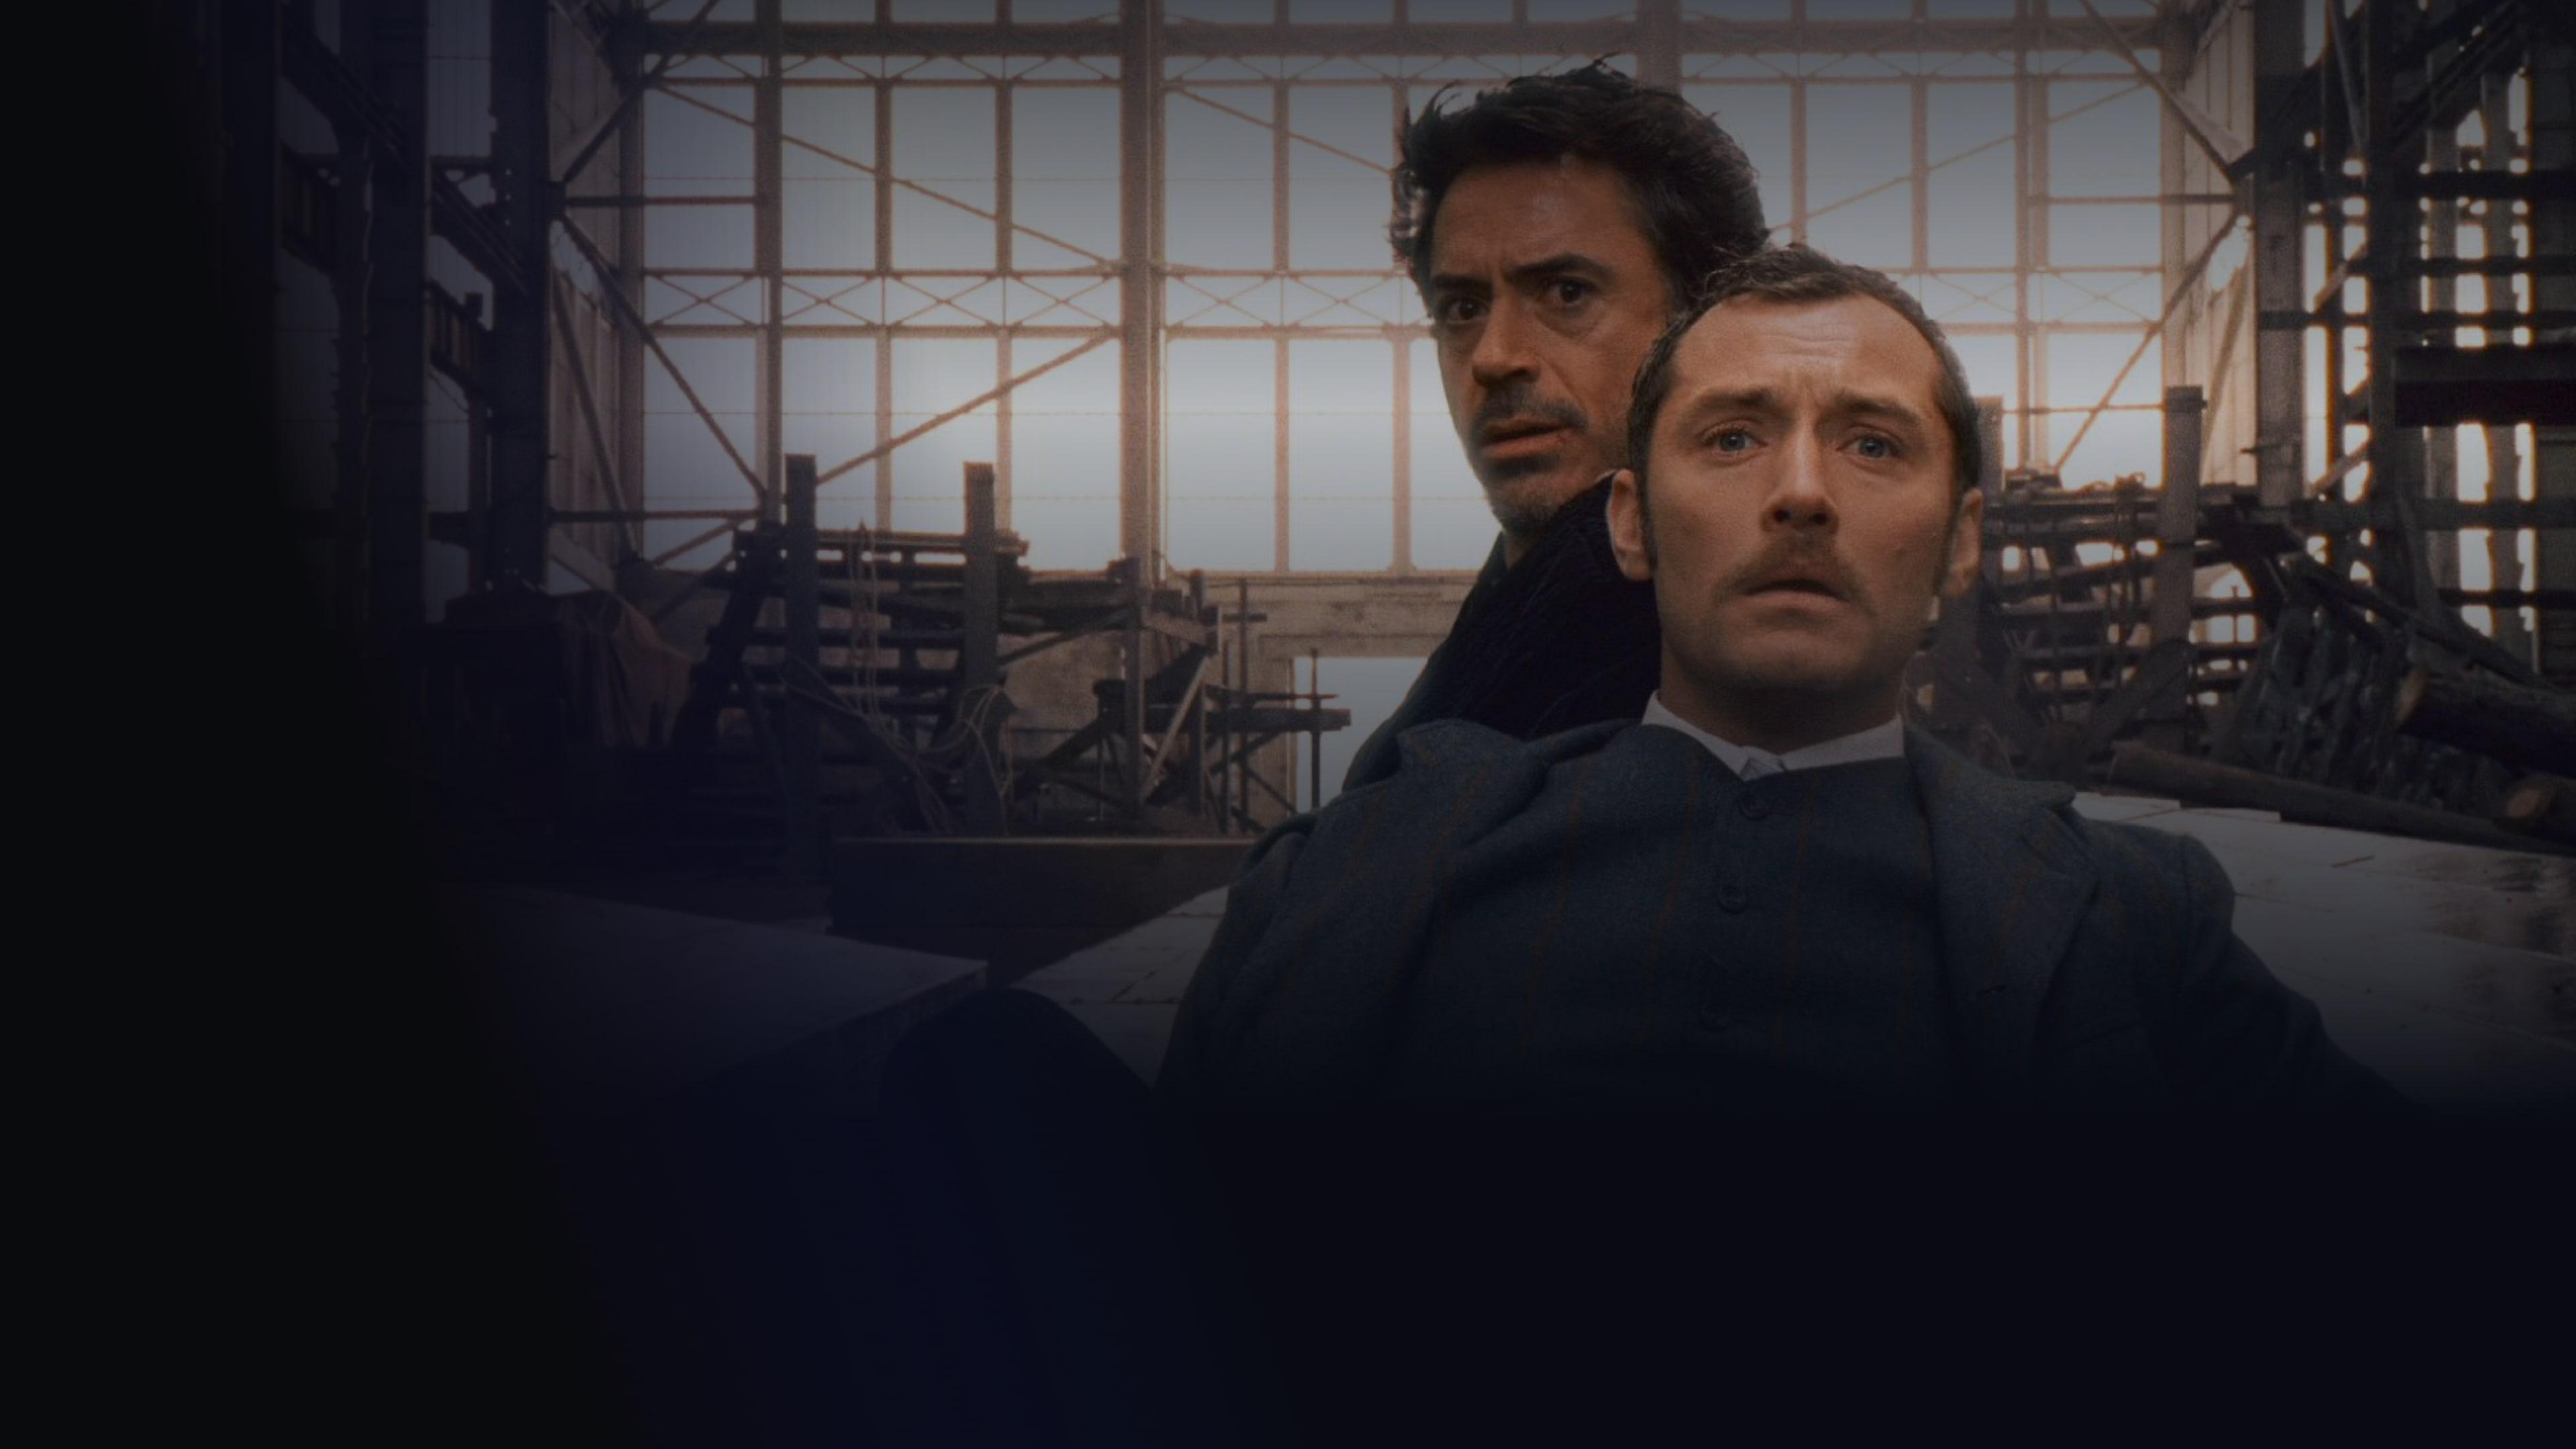 Screenshot from the Sherlock Holmes movie